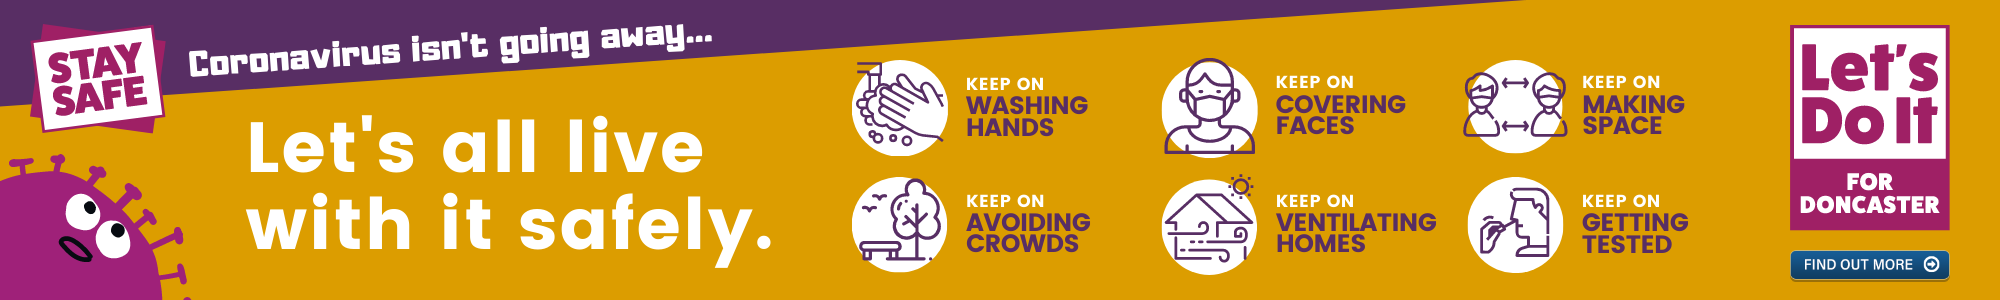 Banner image detailing Coronavirus safely measures